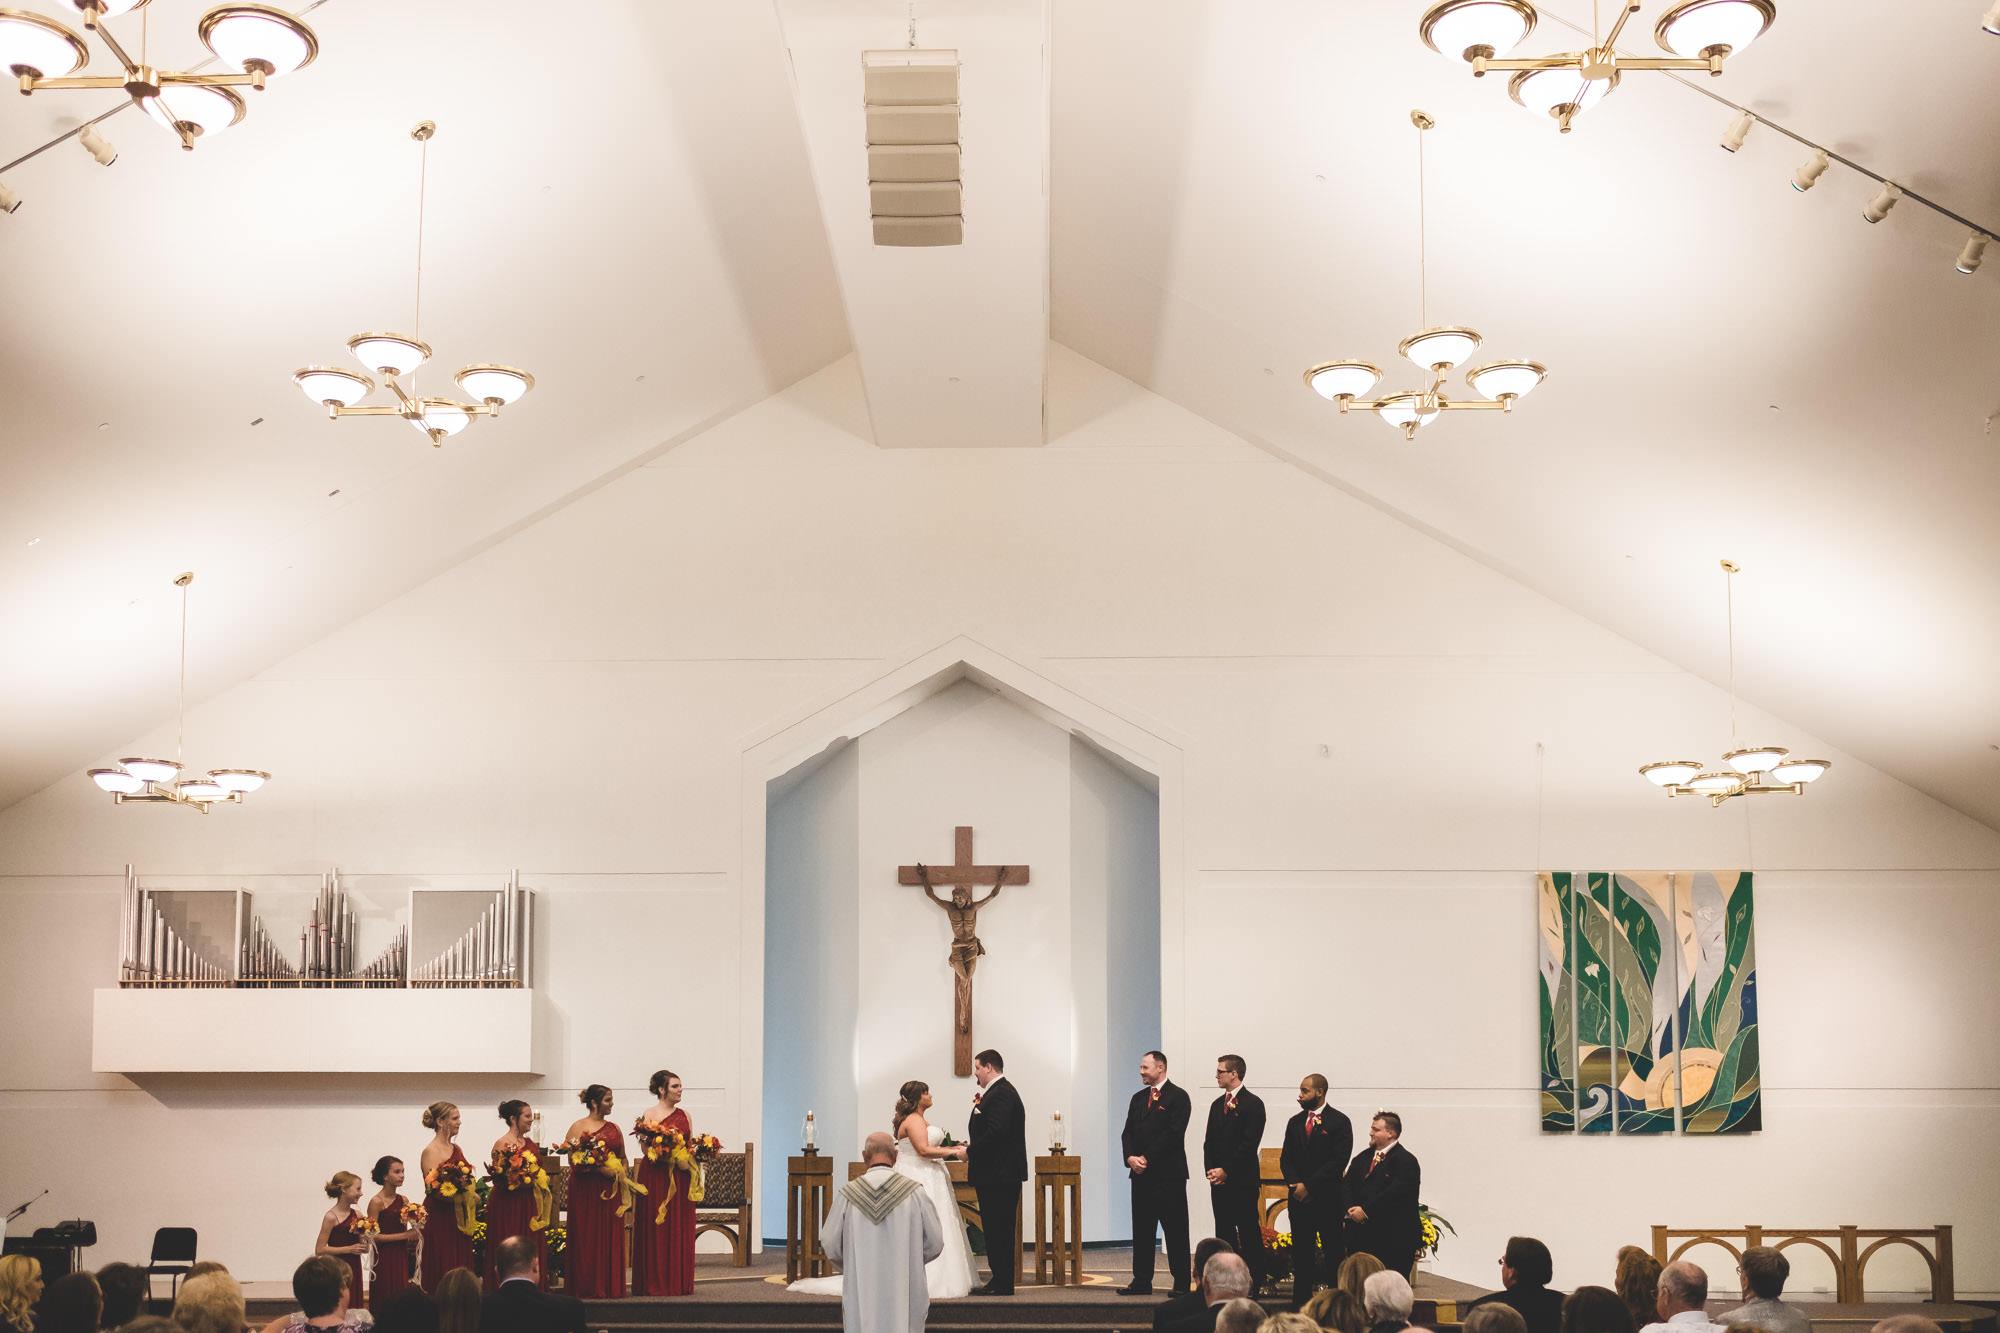 Tyler Ashley Sasser Wedding - www.RHatfieldPhotography.com